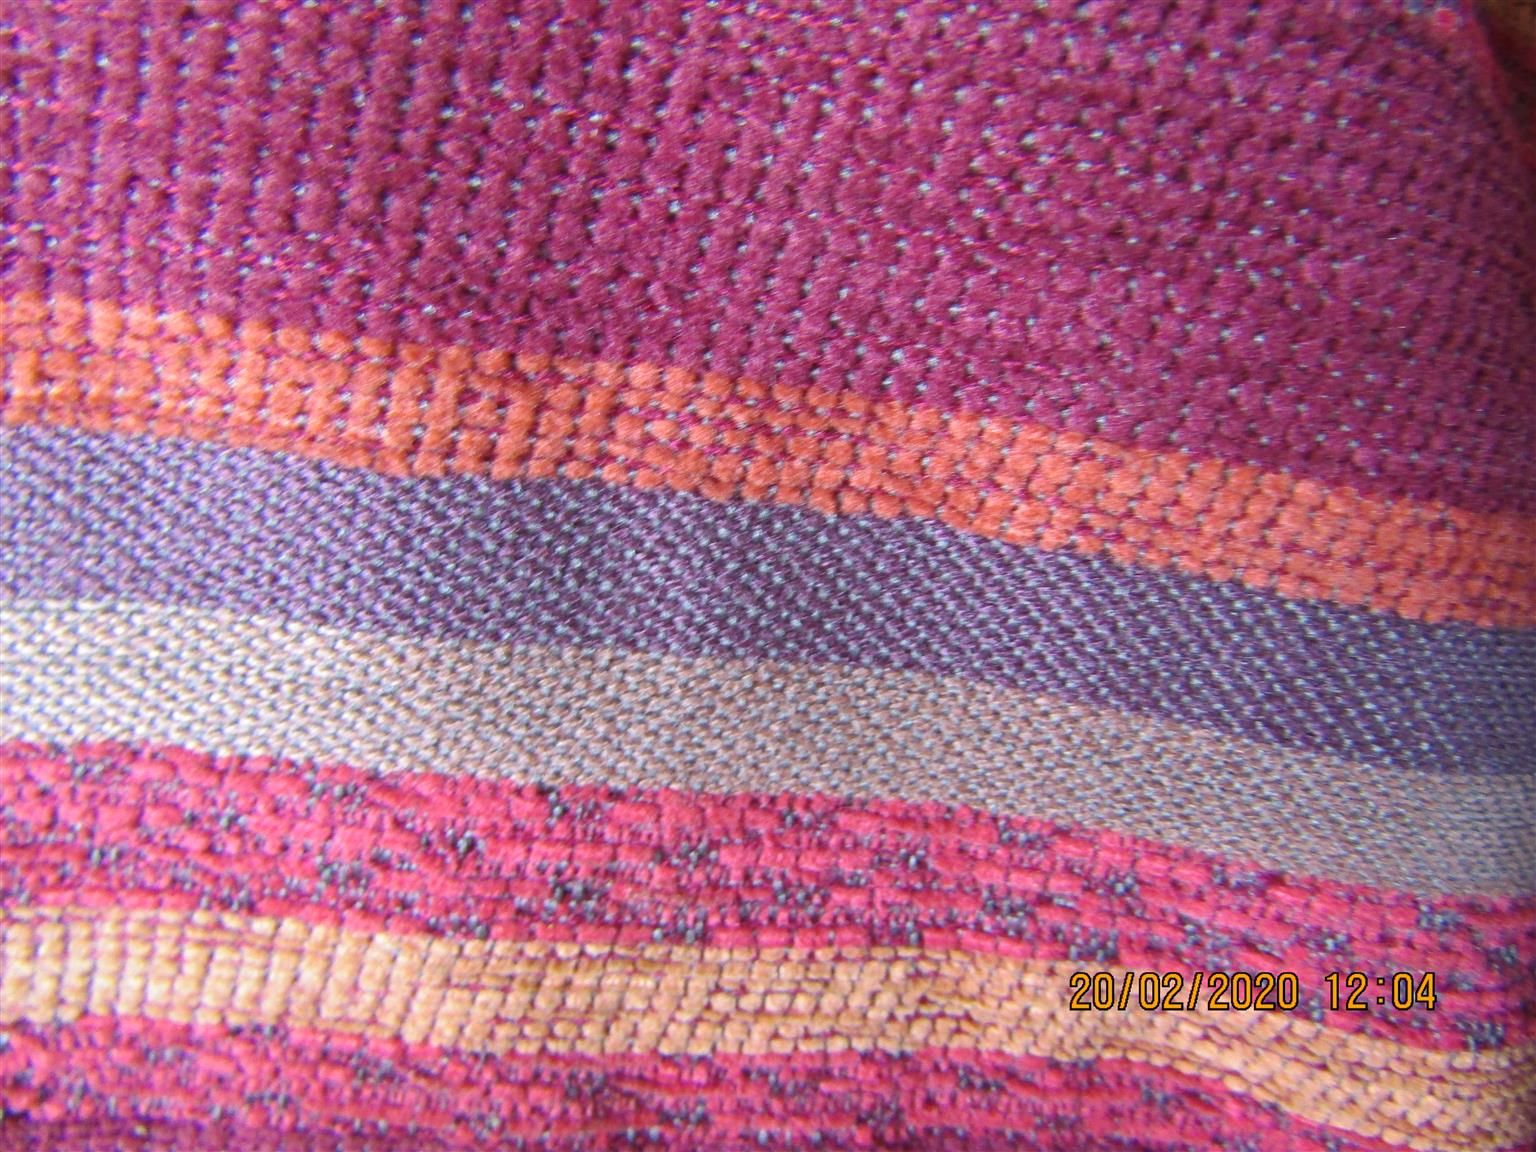 Fabric Roll W=140cm, D=21cm, Weight=11kg